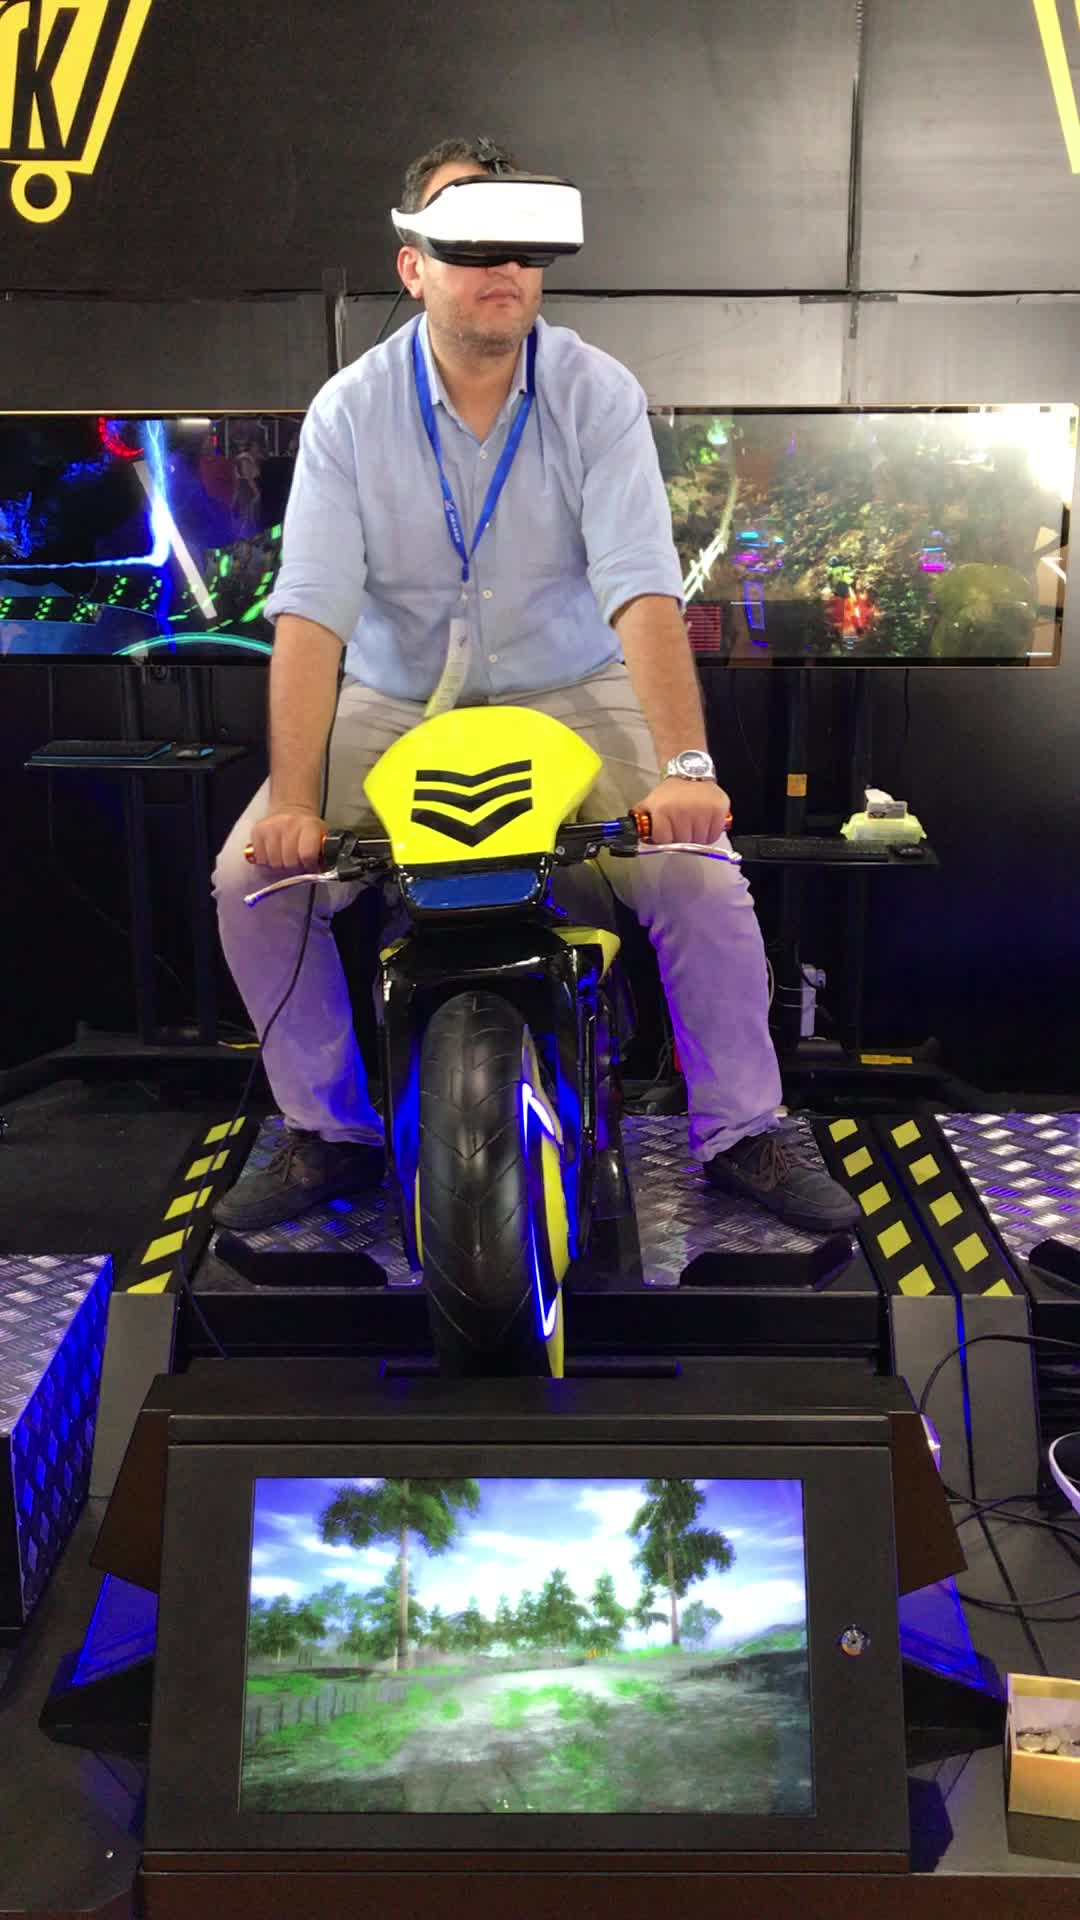 Fastest And Furious VR Simulator Moto Ride Motorcycle VR Simulator